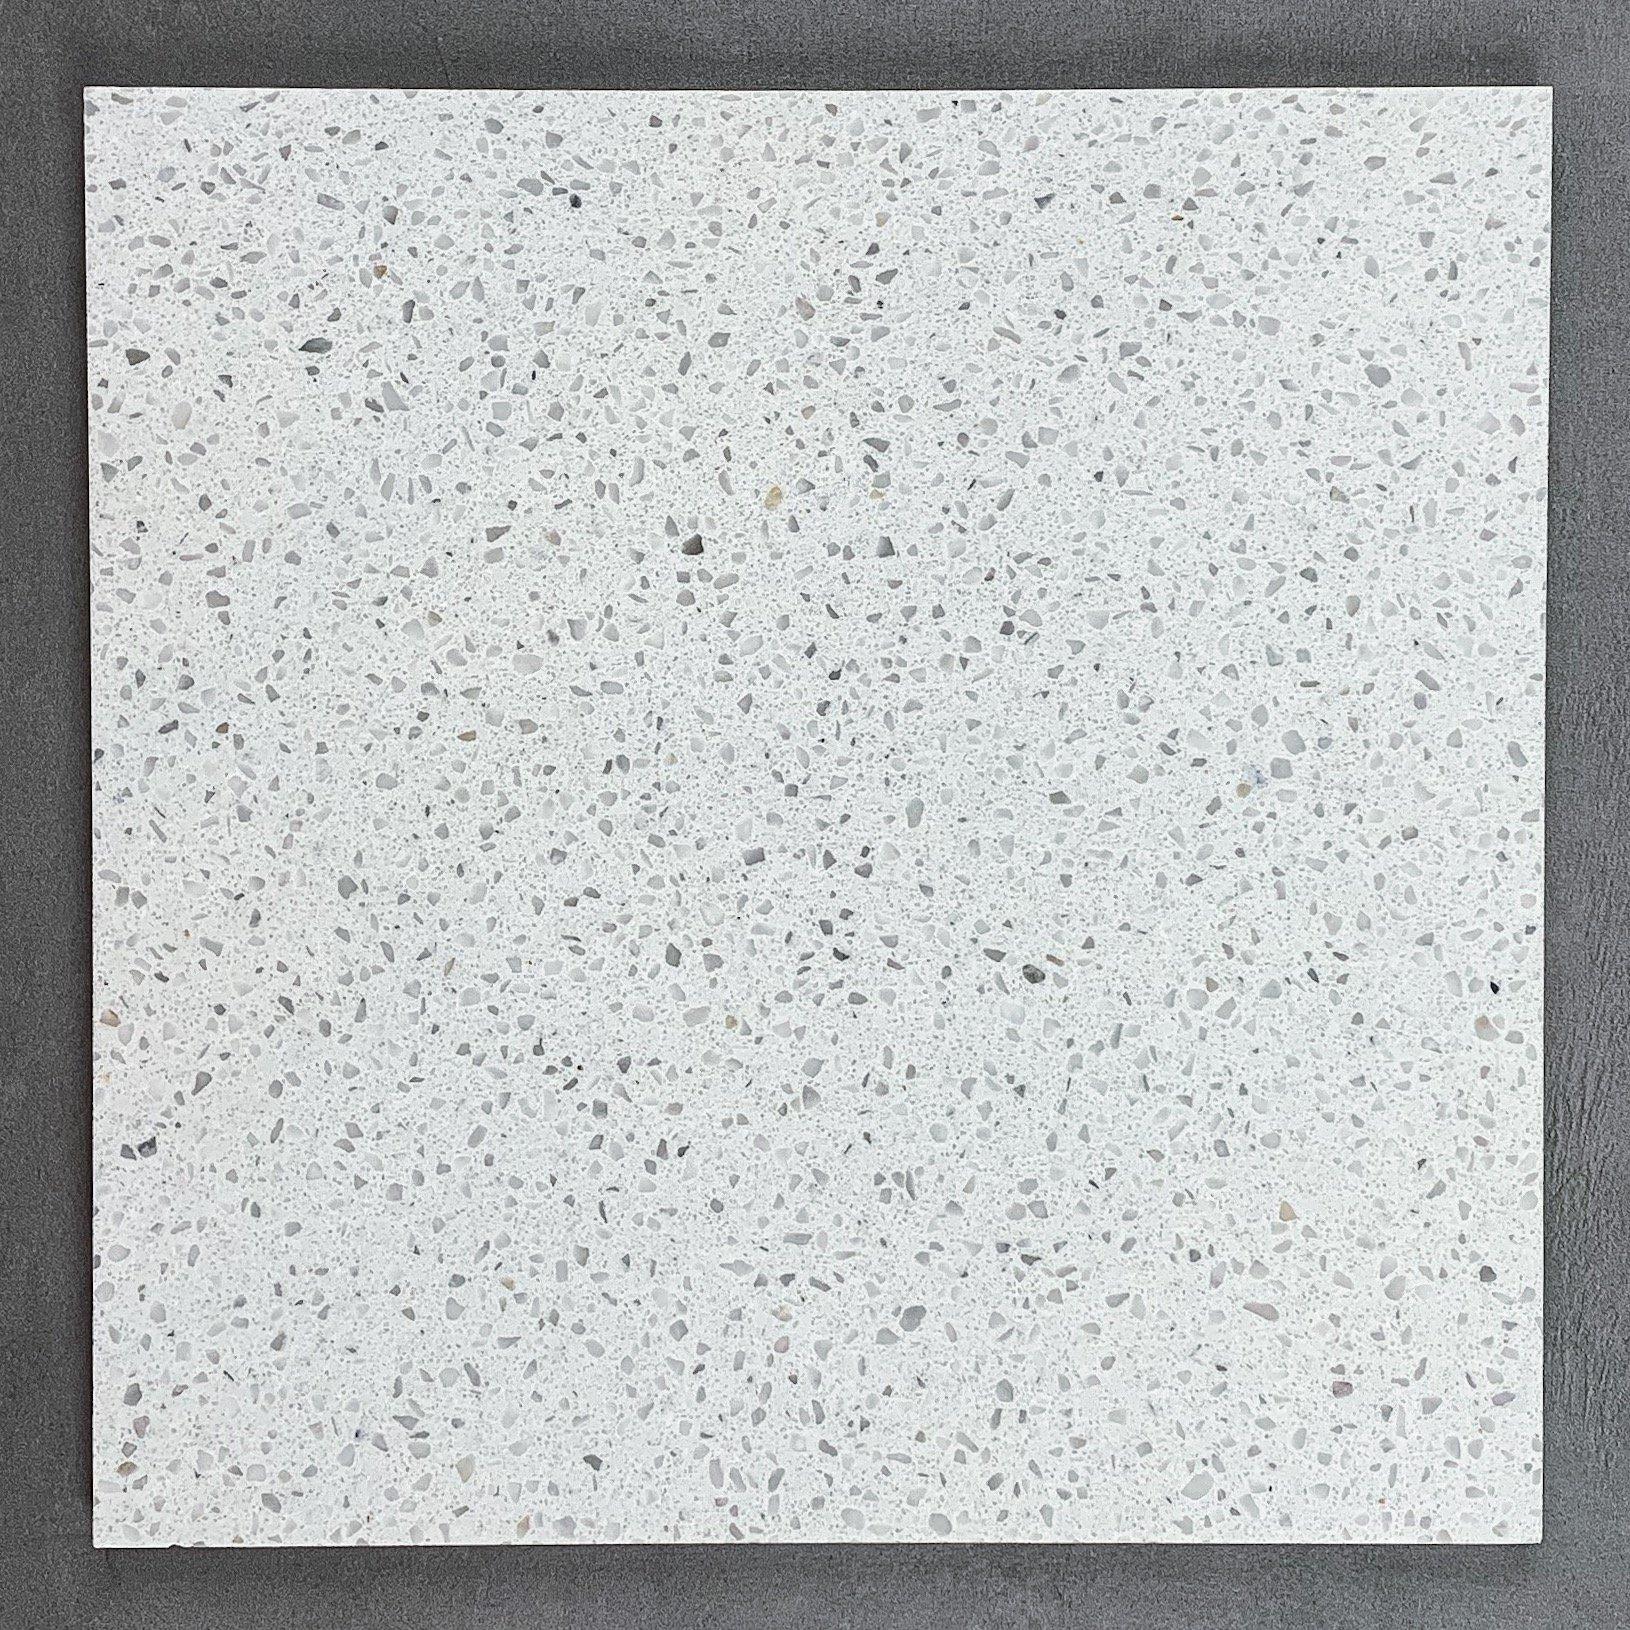 nw5- Terrazzo Resin tiles